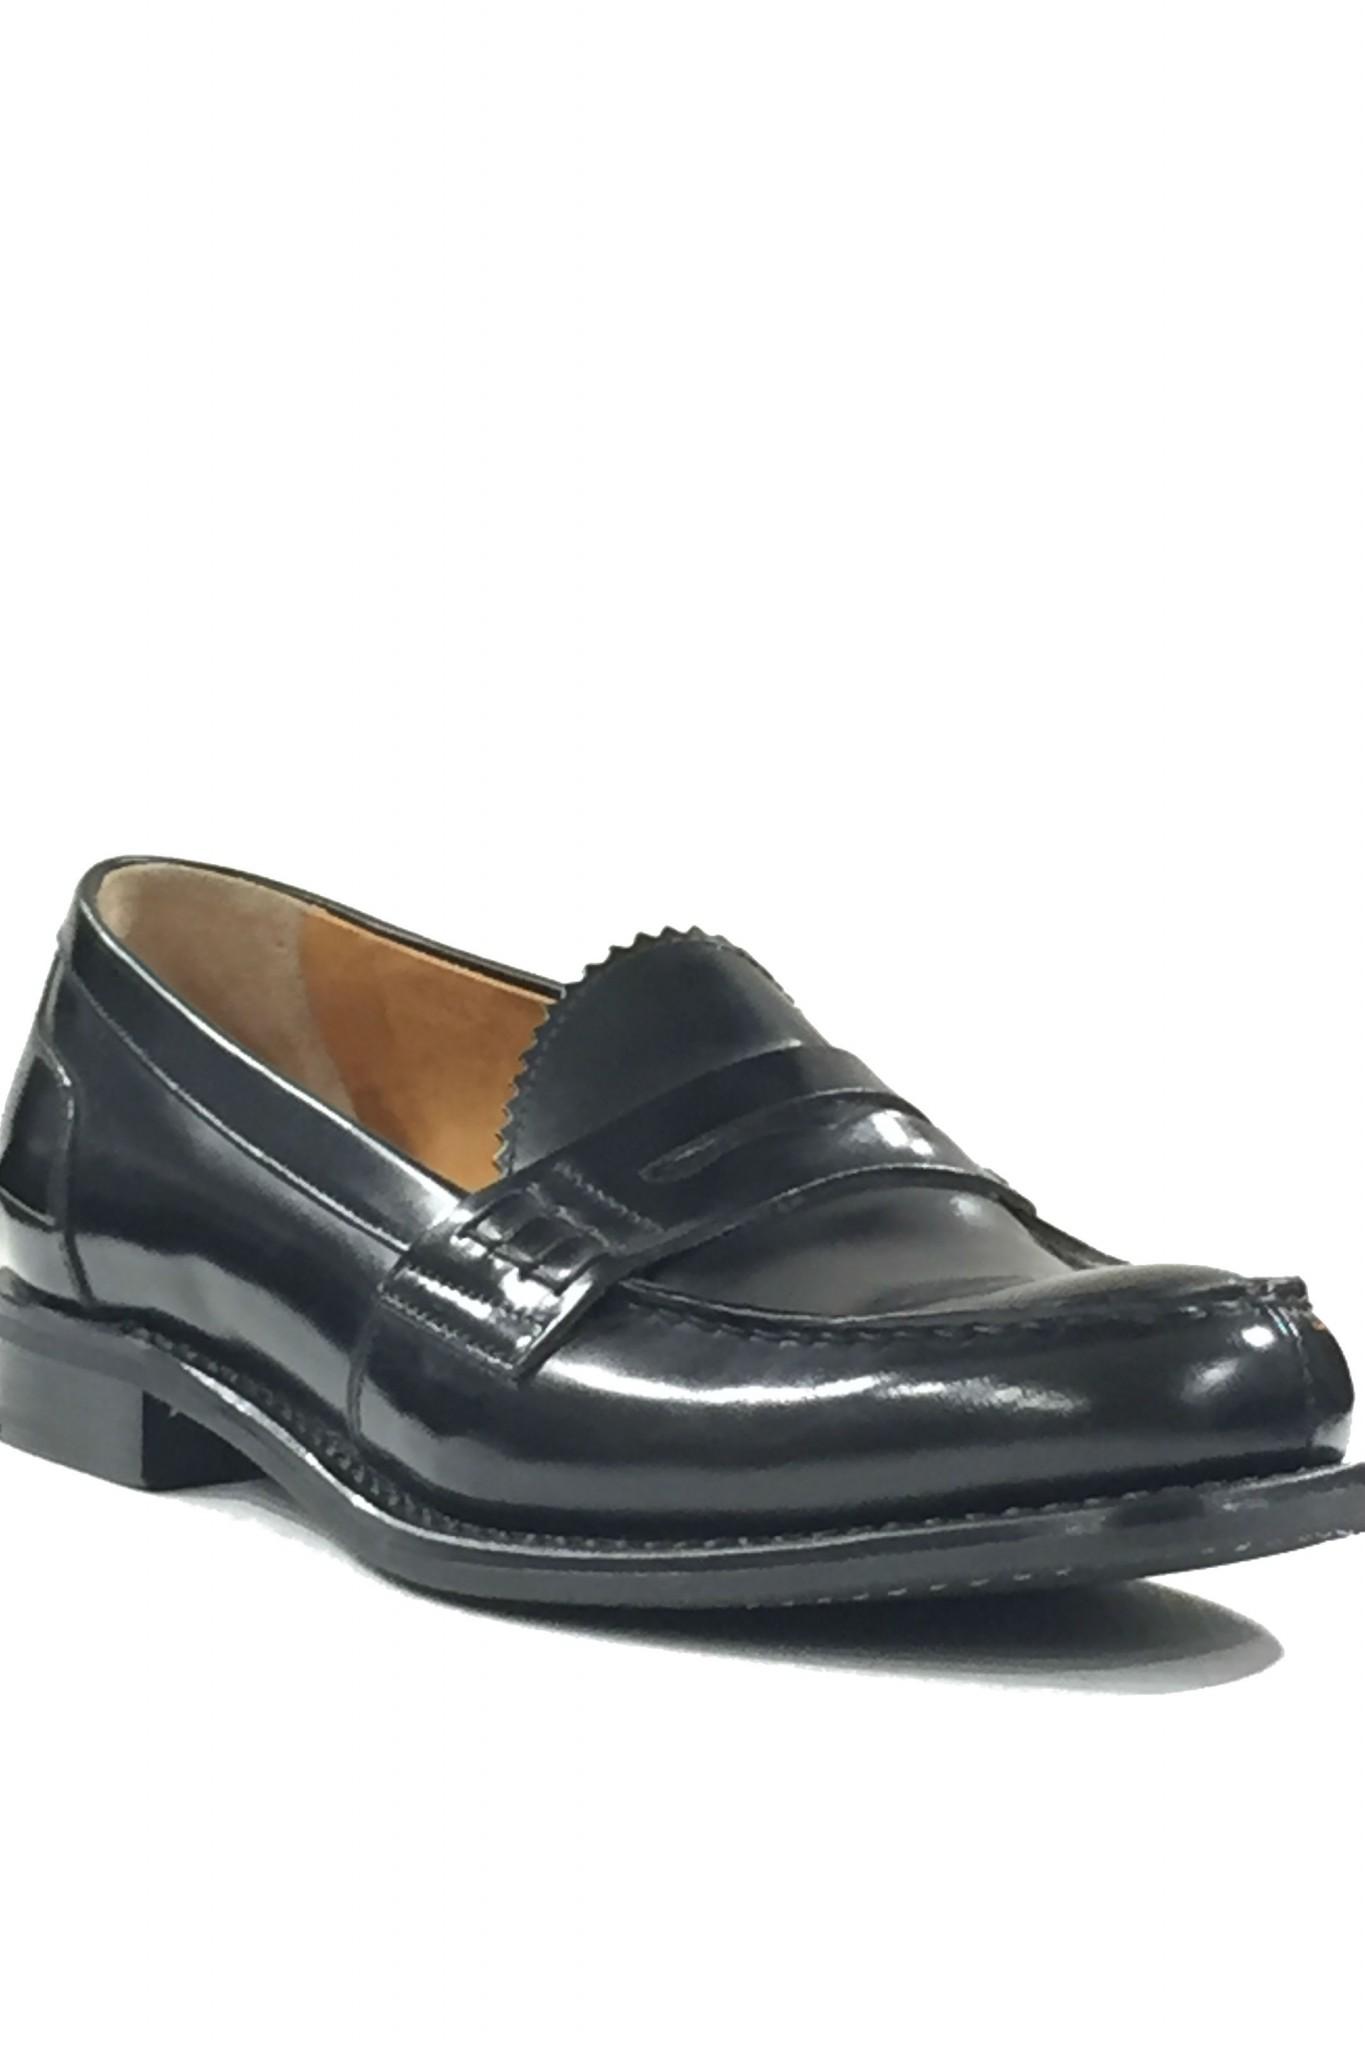 college scarpe donna churchs